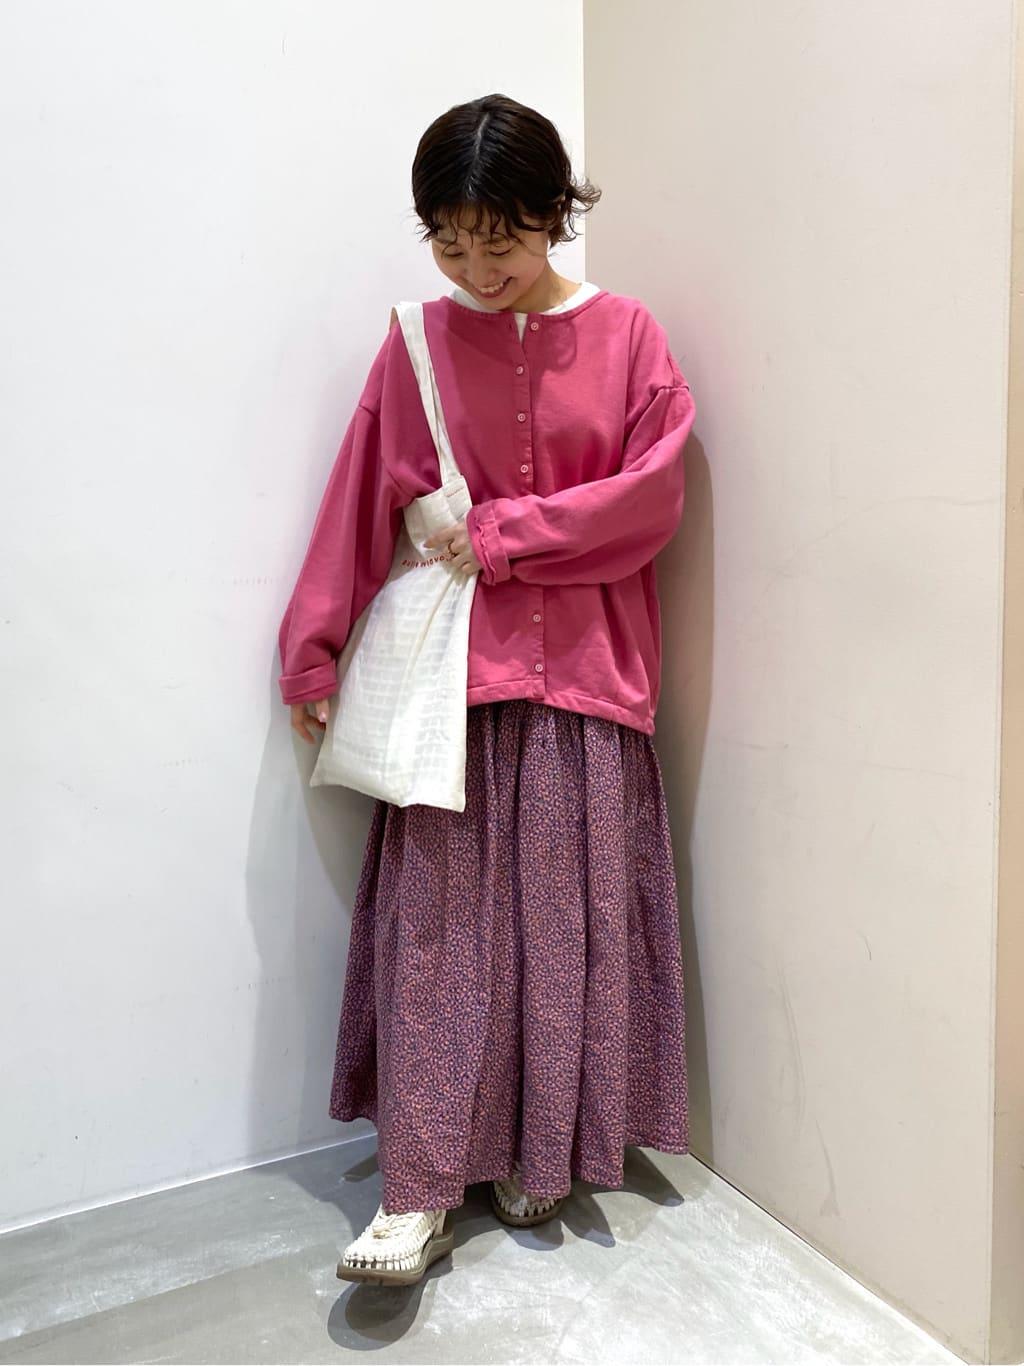 bulle de savon 阪急西宮ガーデンズ 身長:149cm 2021.08.26